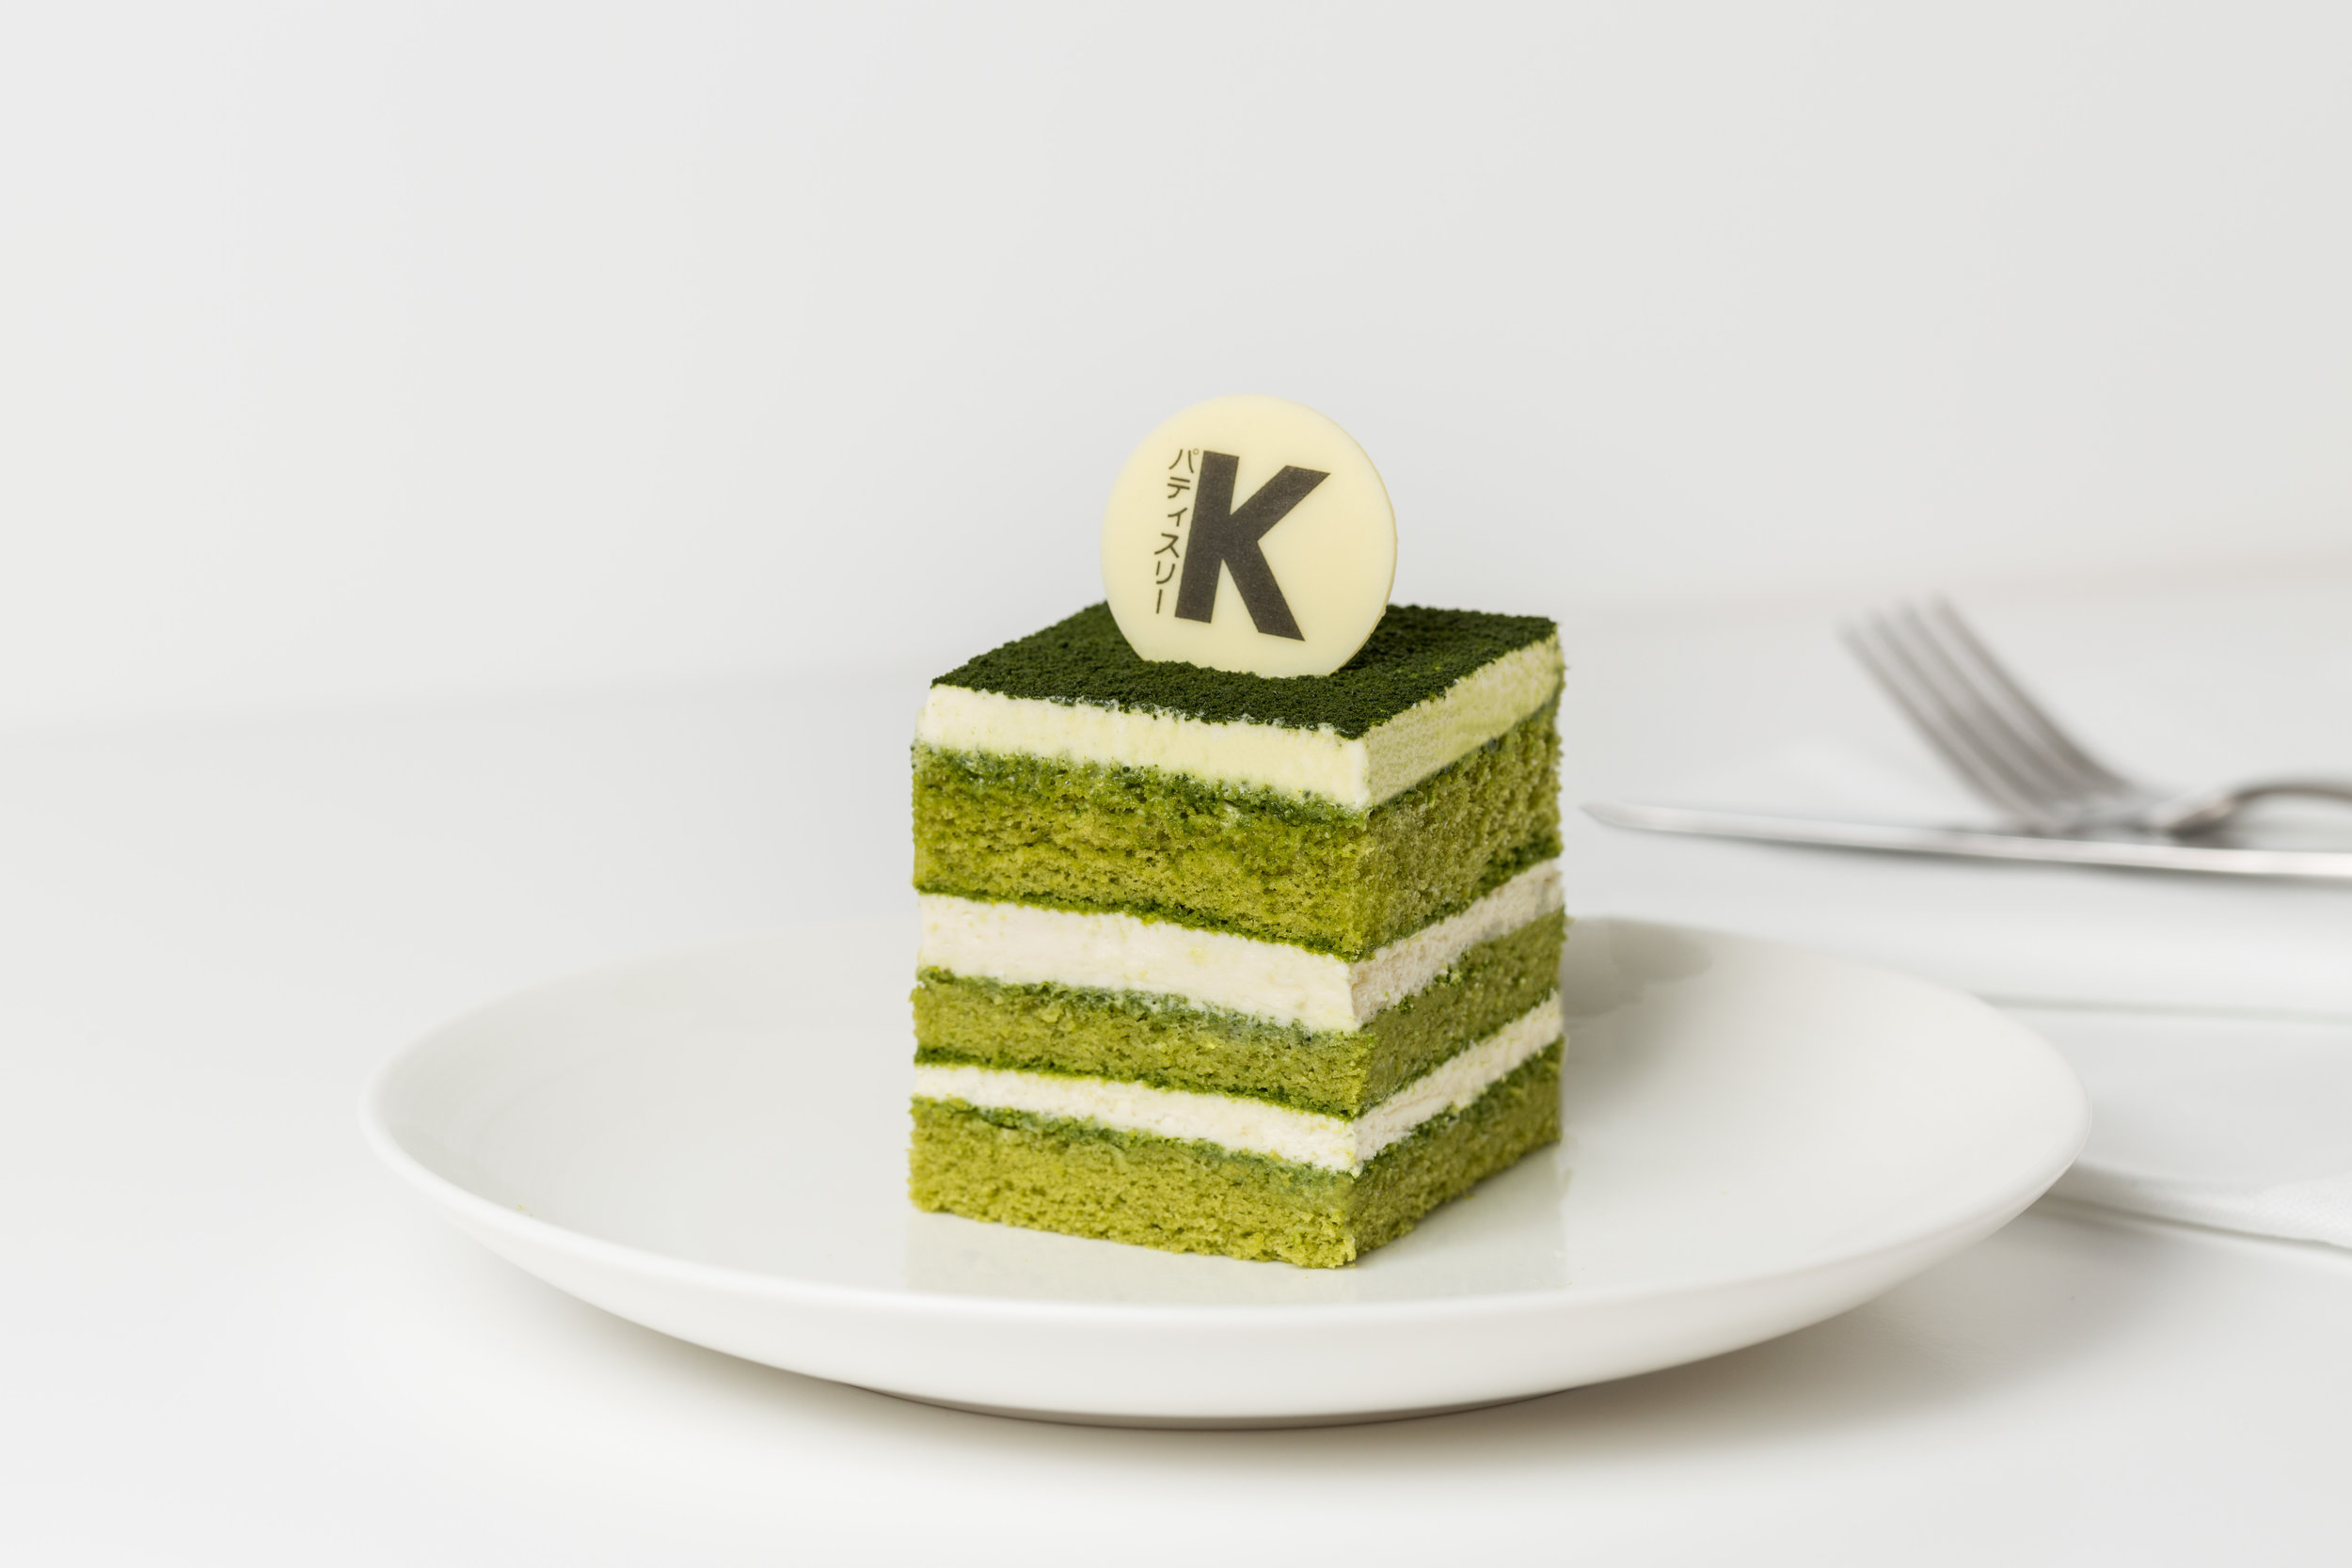 Kova Japanese Patisserie In Soho London Mille Crepes Chiffon Cakes